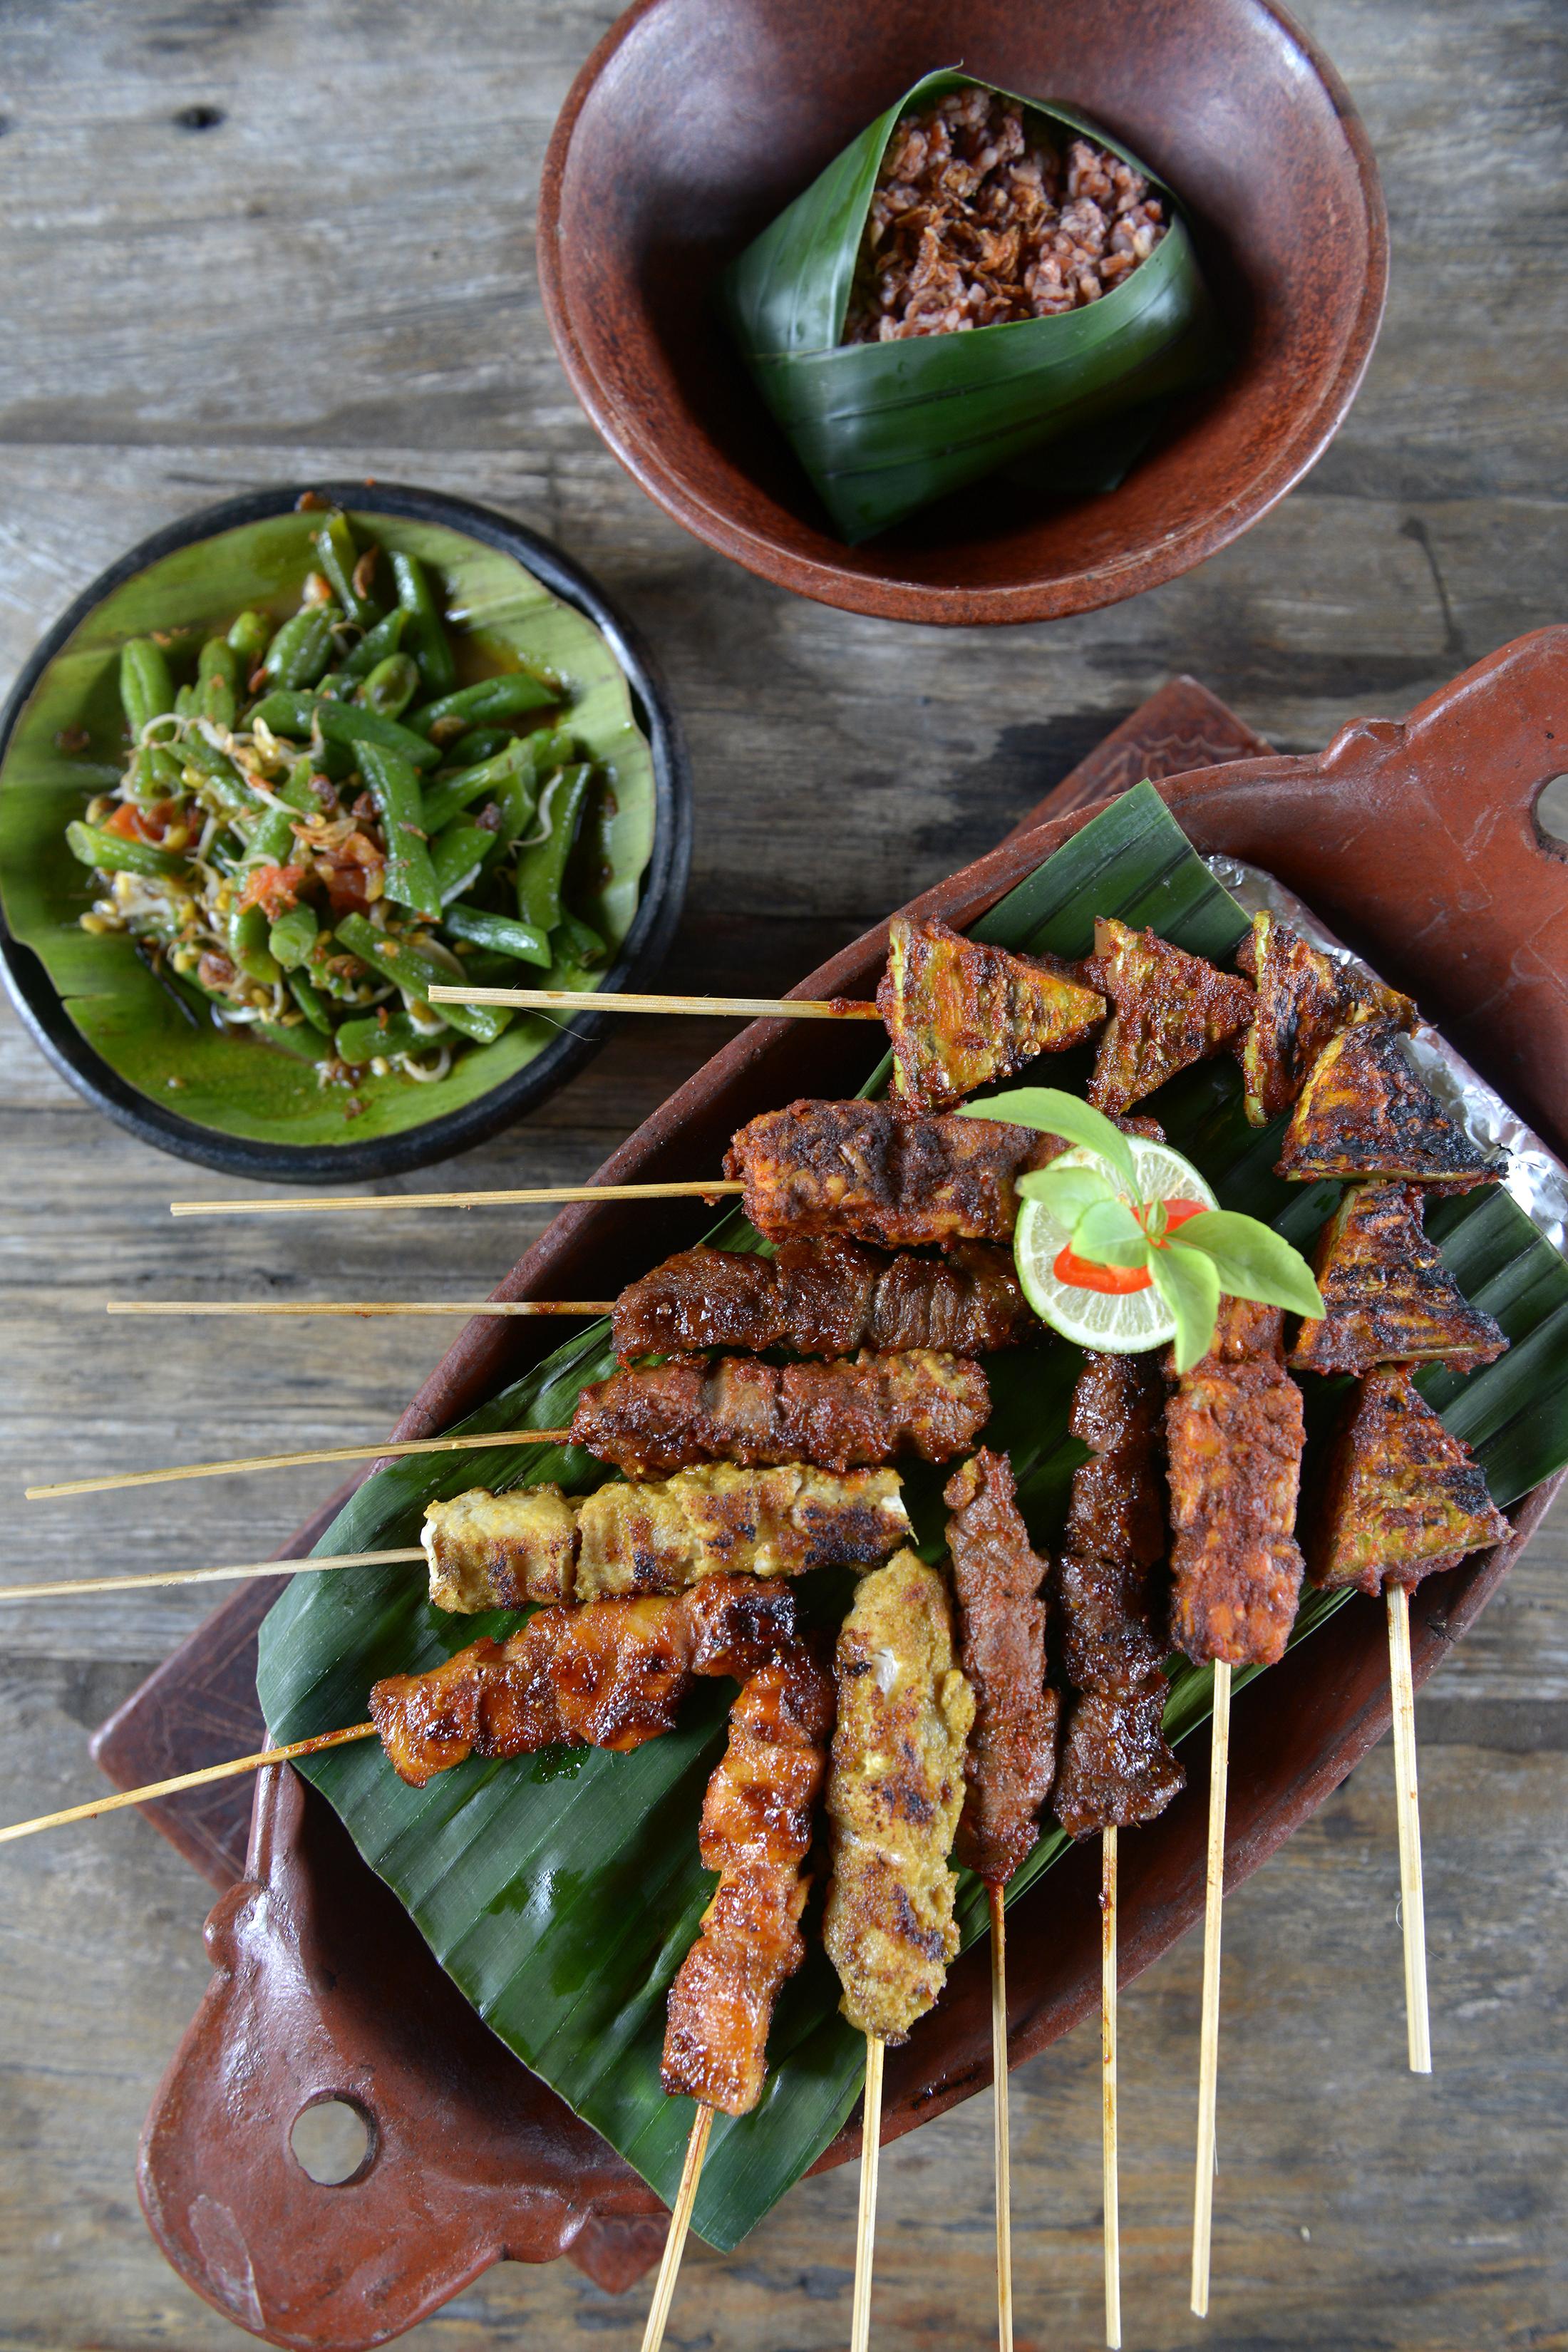 Ruoka-annos, Indonesia, Satay